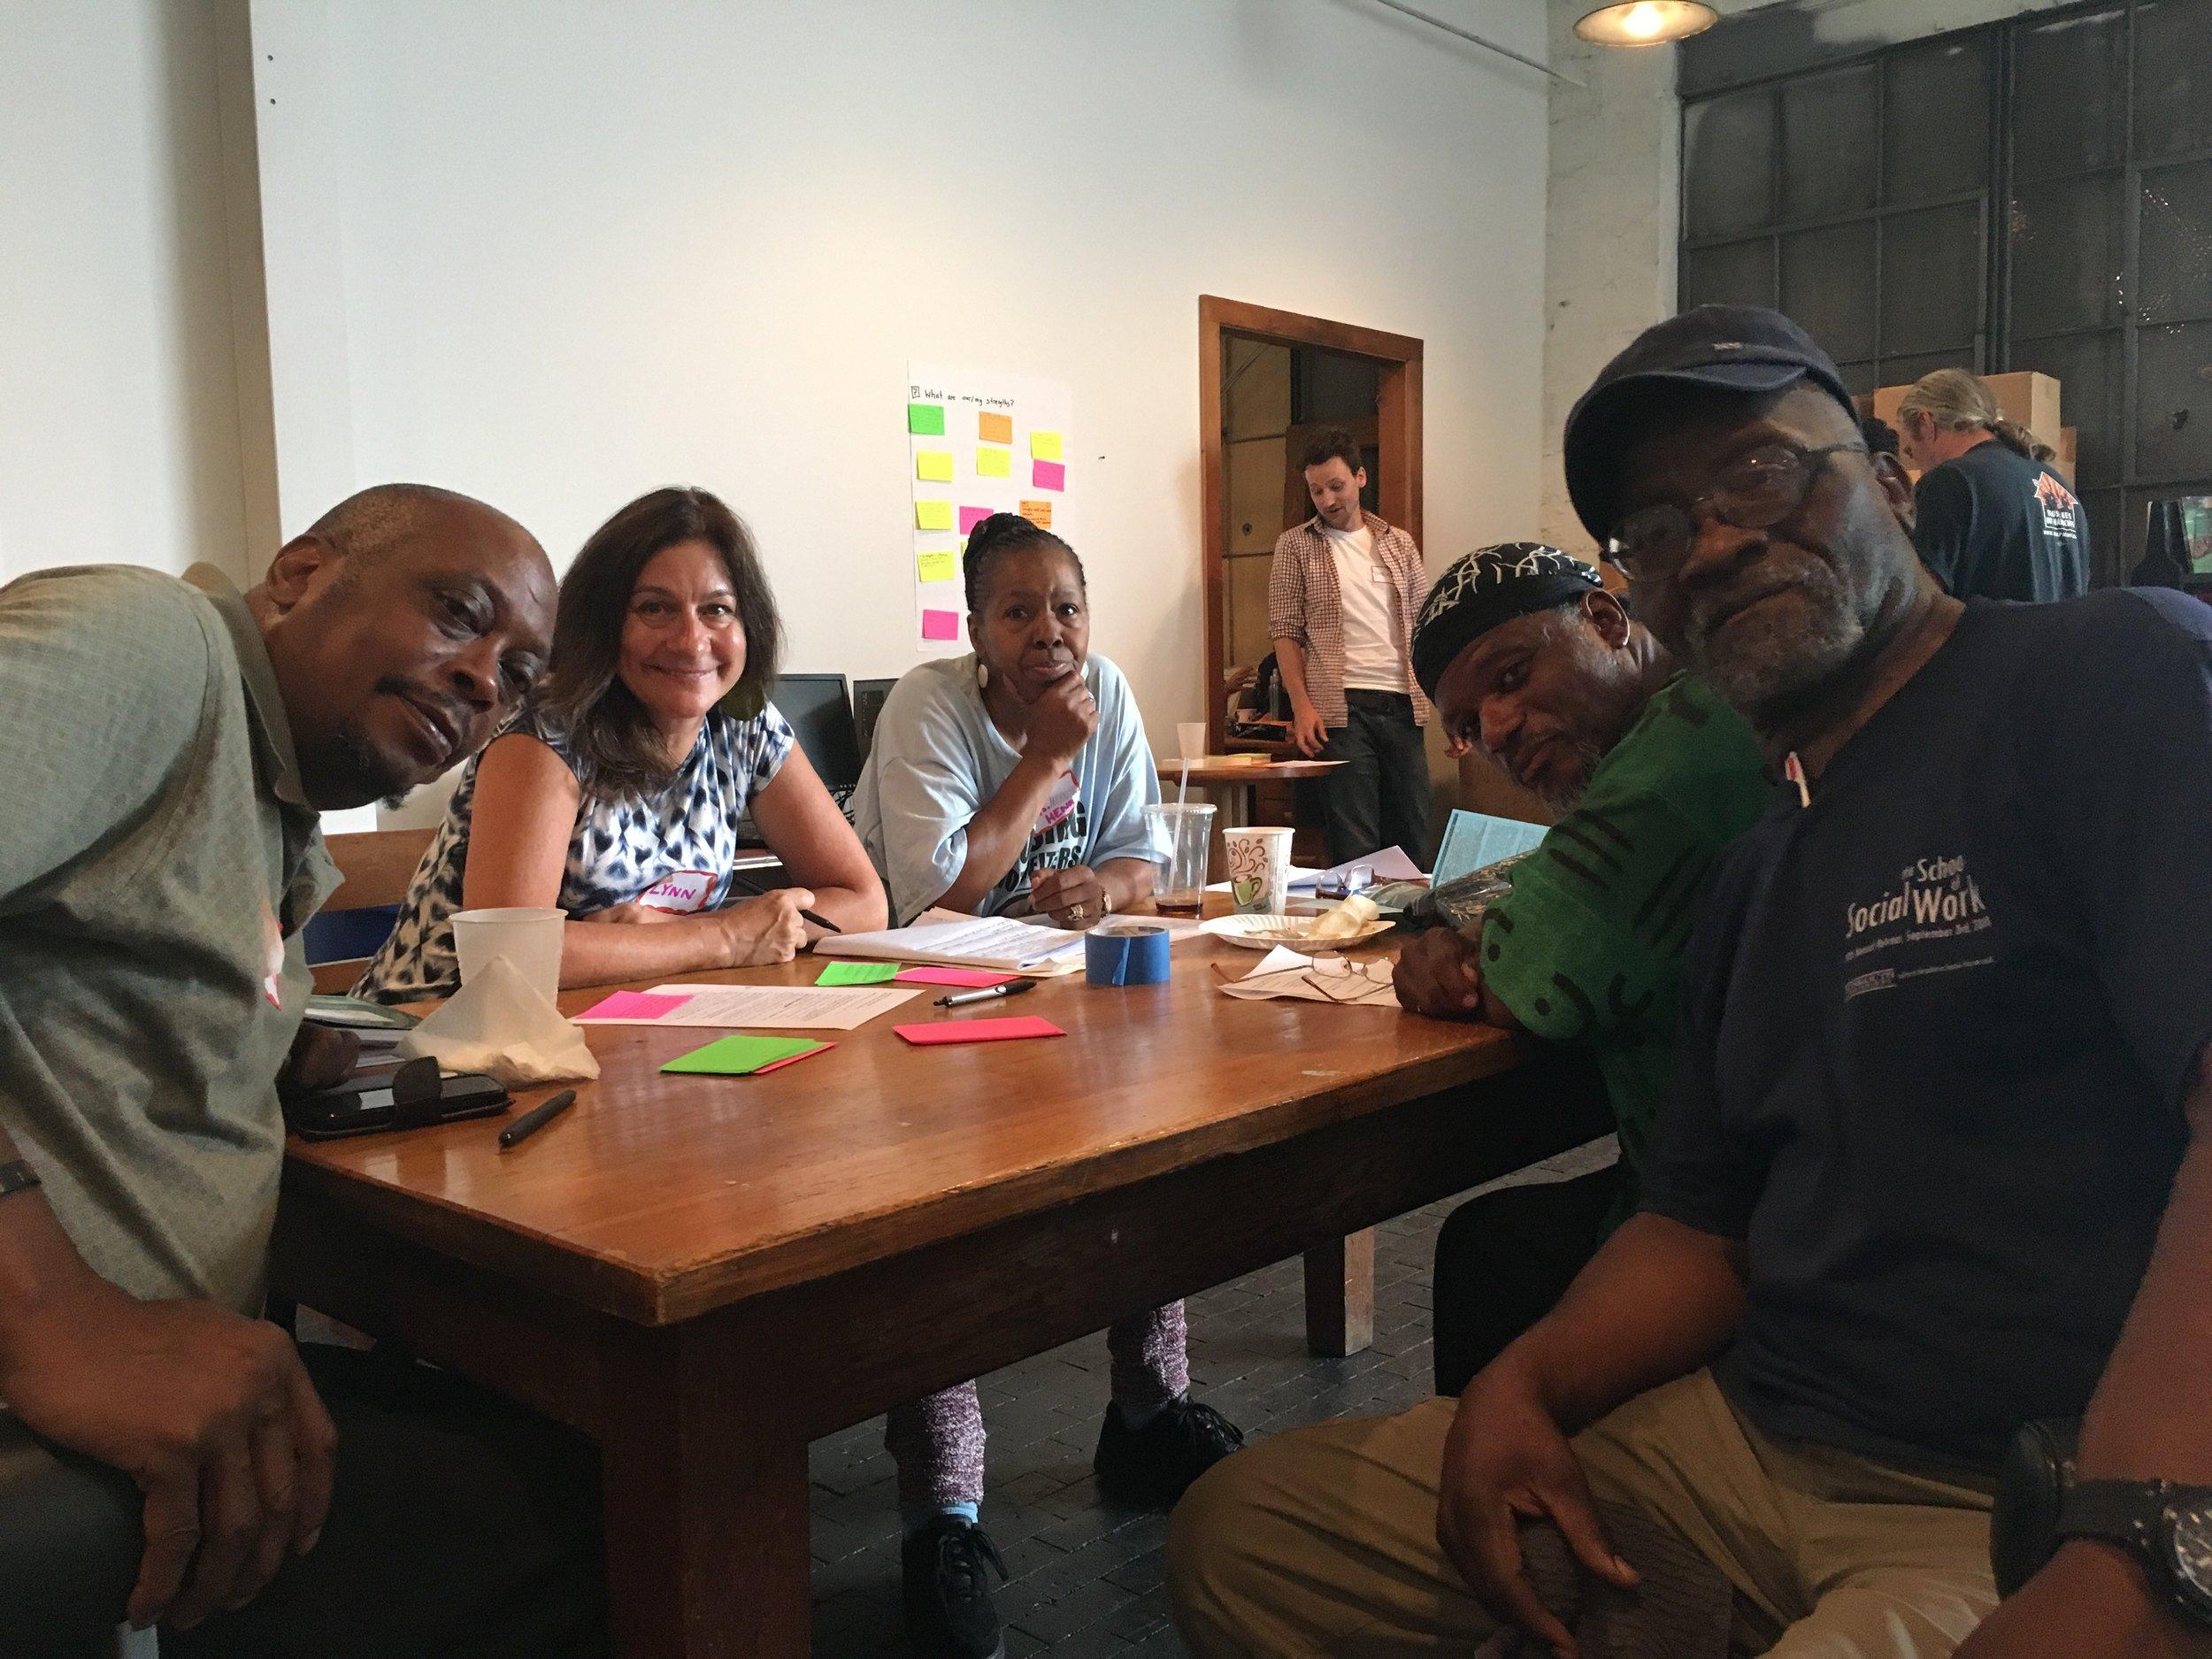 Poor-Peoples-Campaign-Planning-in-Baltimore-2016.jpg